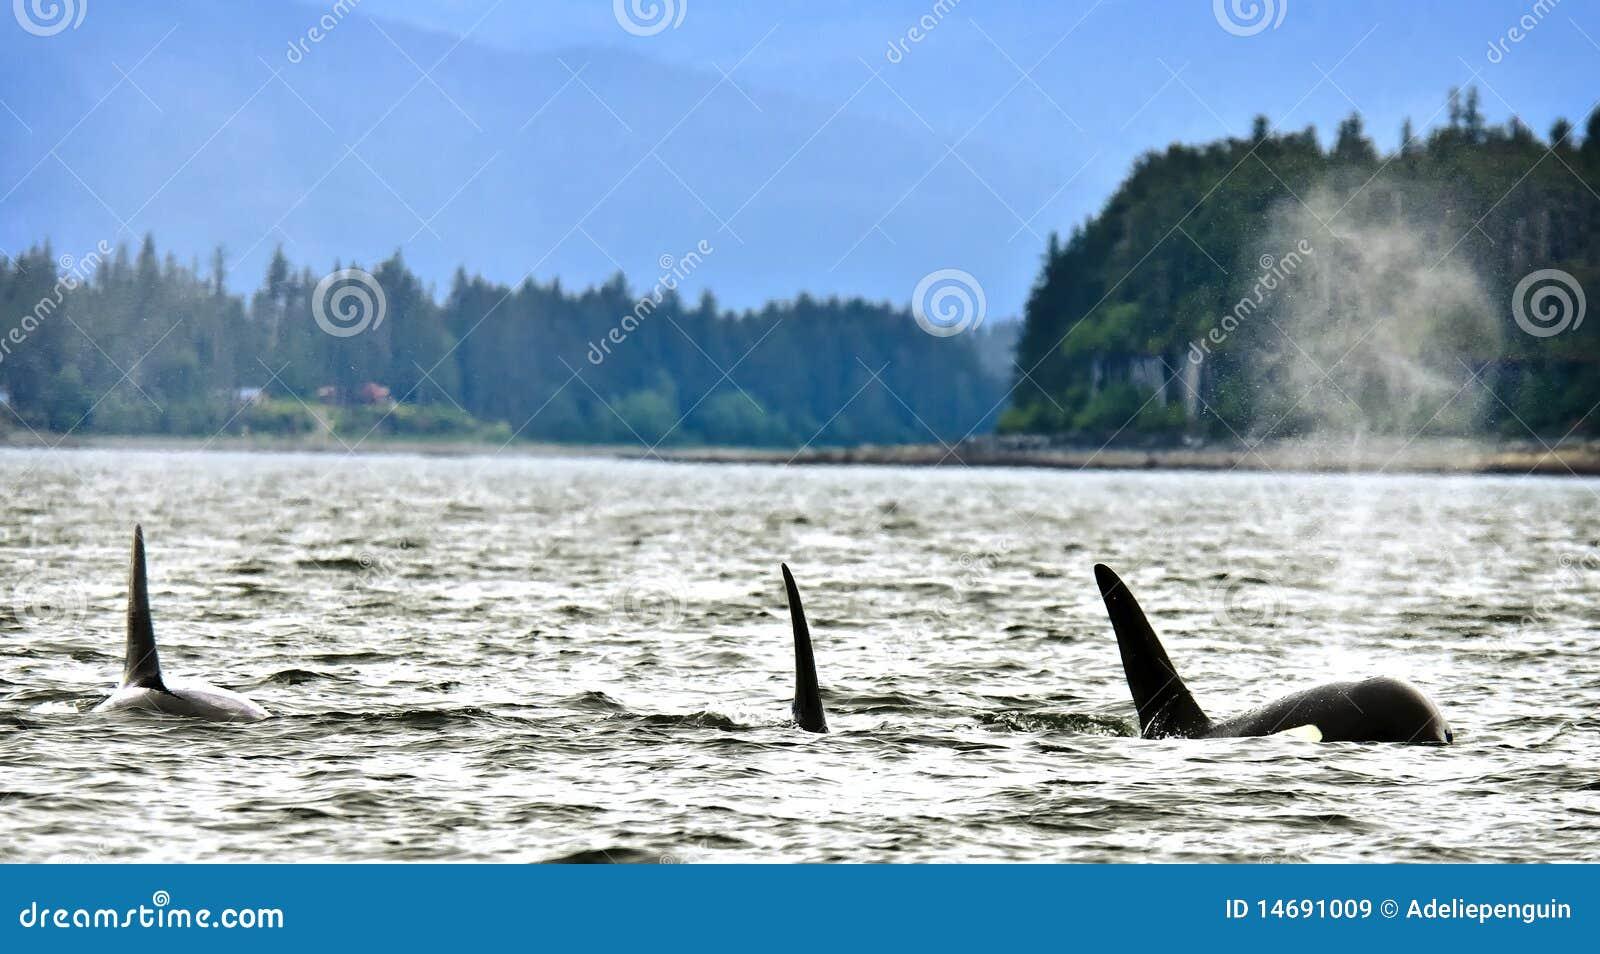 Alaska orcas